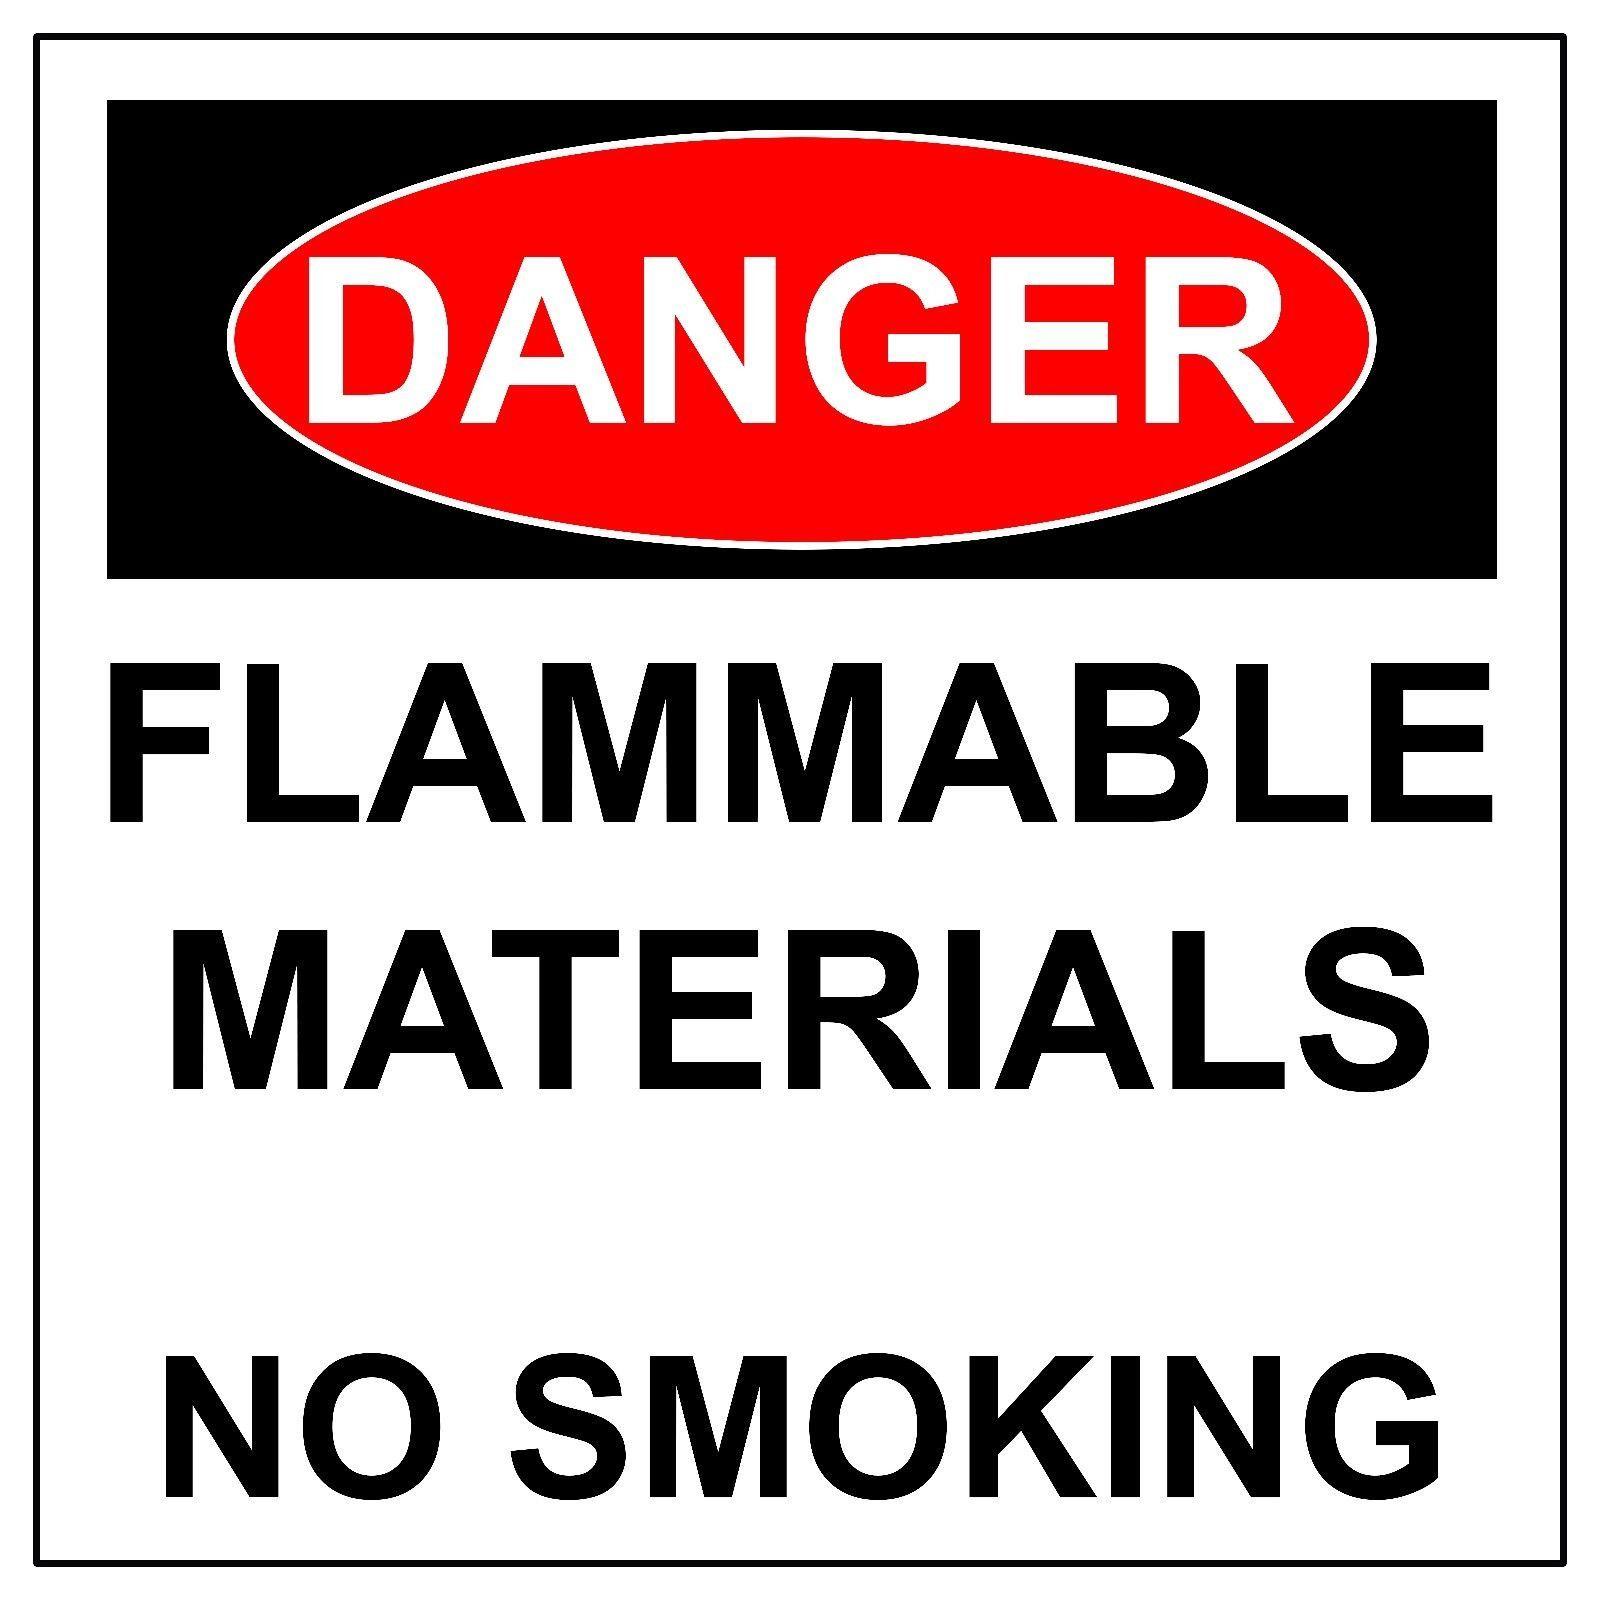 Danger Flammable Materials No Smoking Aluminum Metal Safety Warning UV Sign